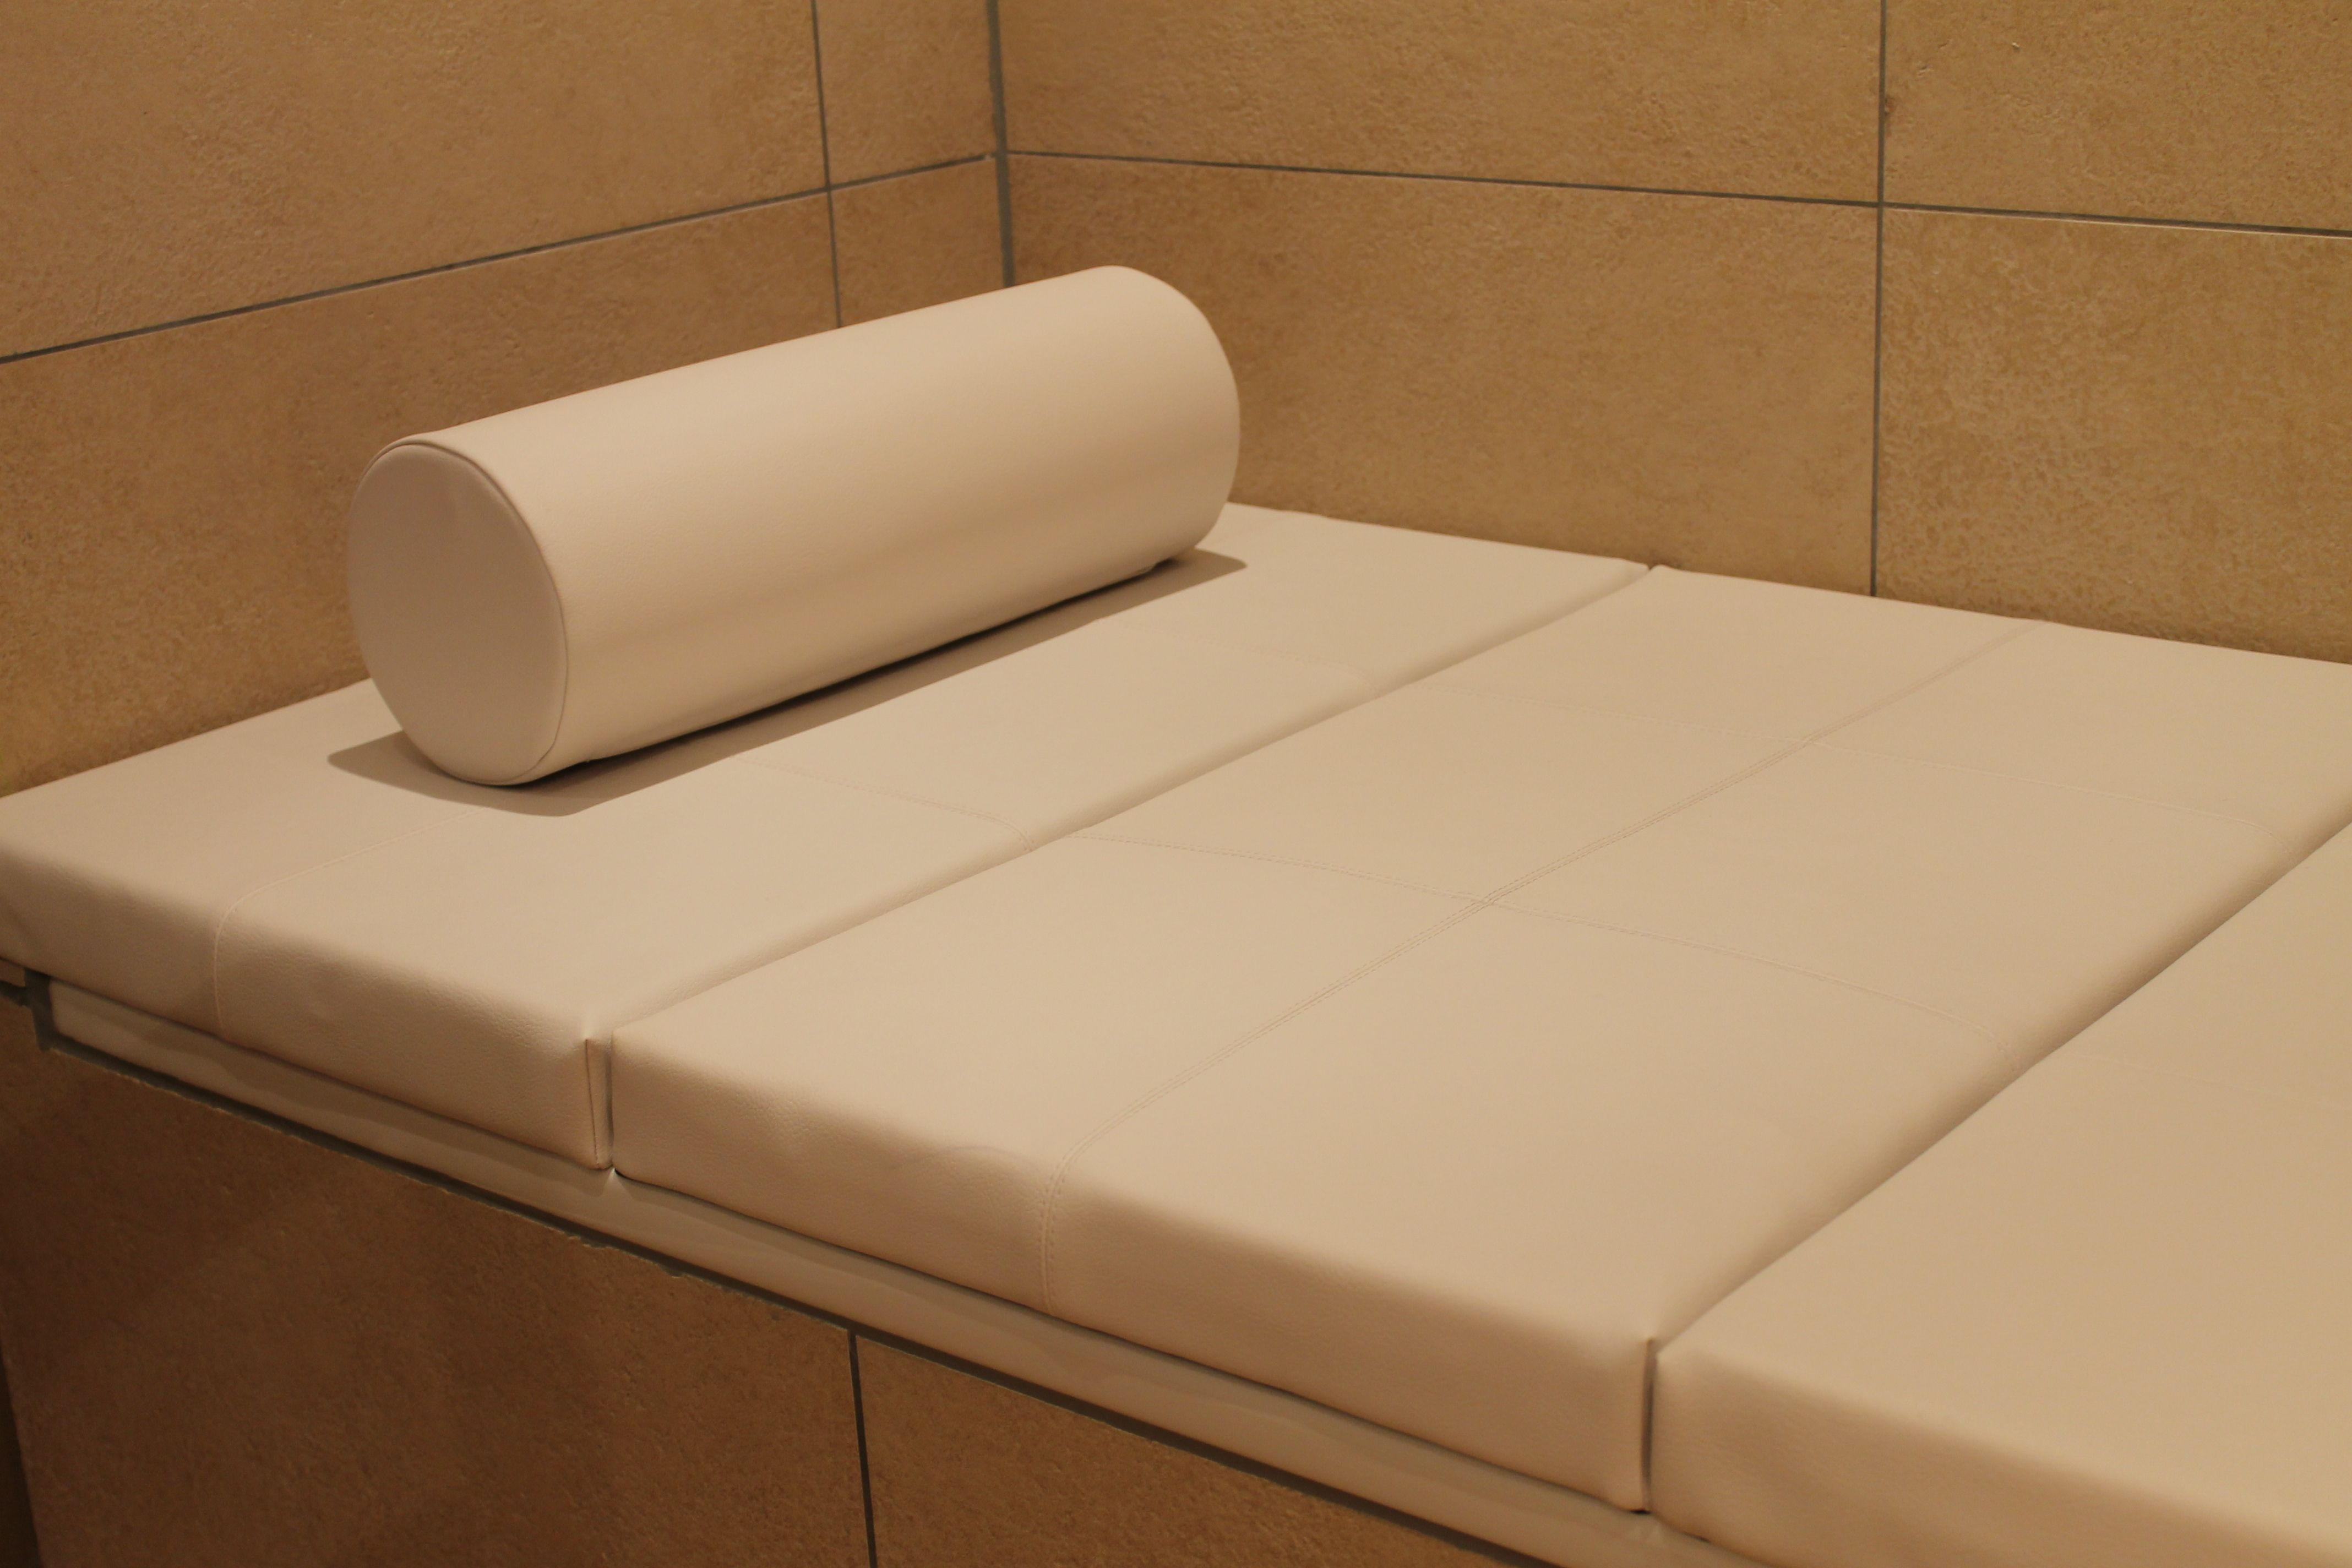 badewannen abdeckung abdeckung f r badewanne pinterest bathtub cover washroom and bathtubs. Black Bedroom Furniture Sets. Home Design Ideas